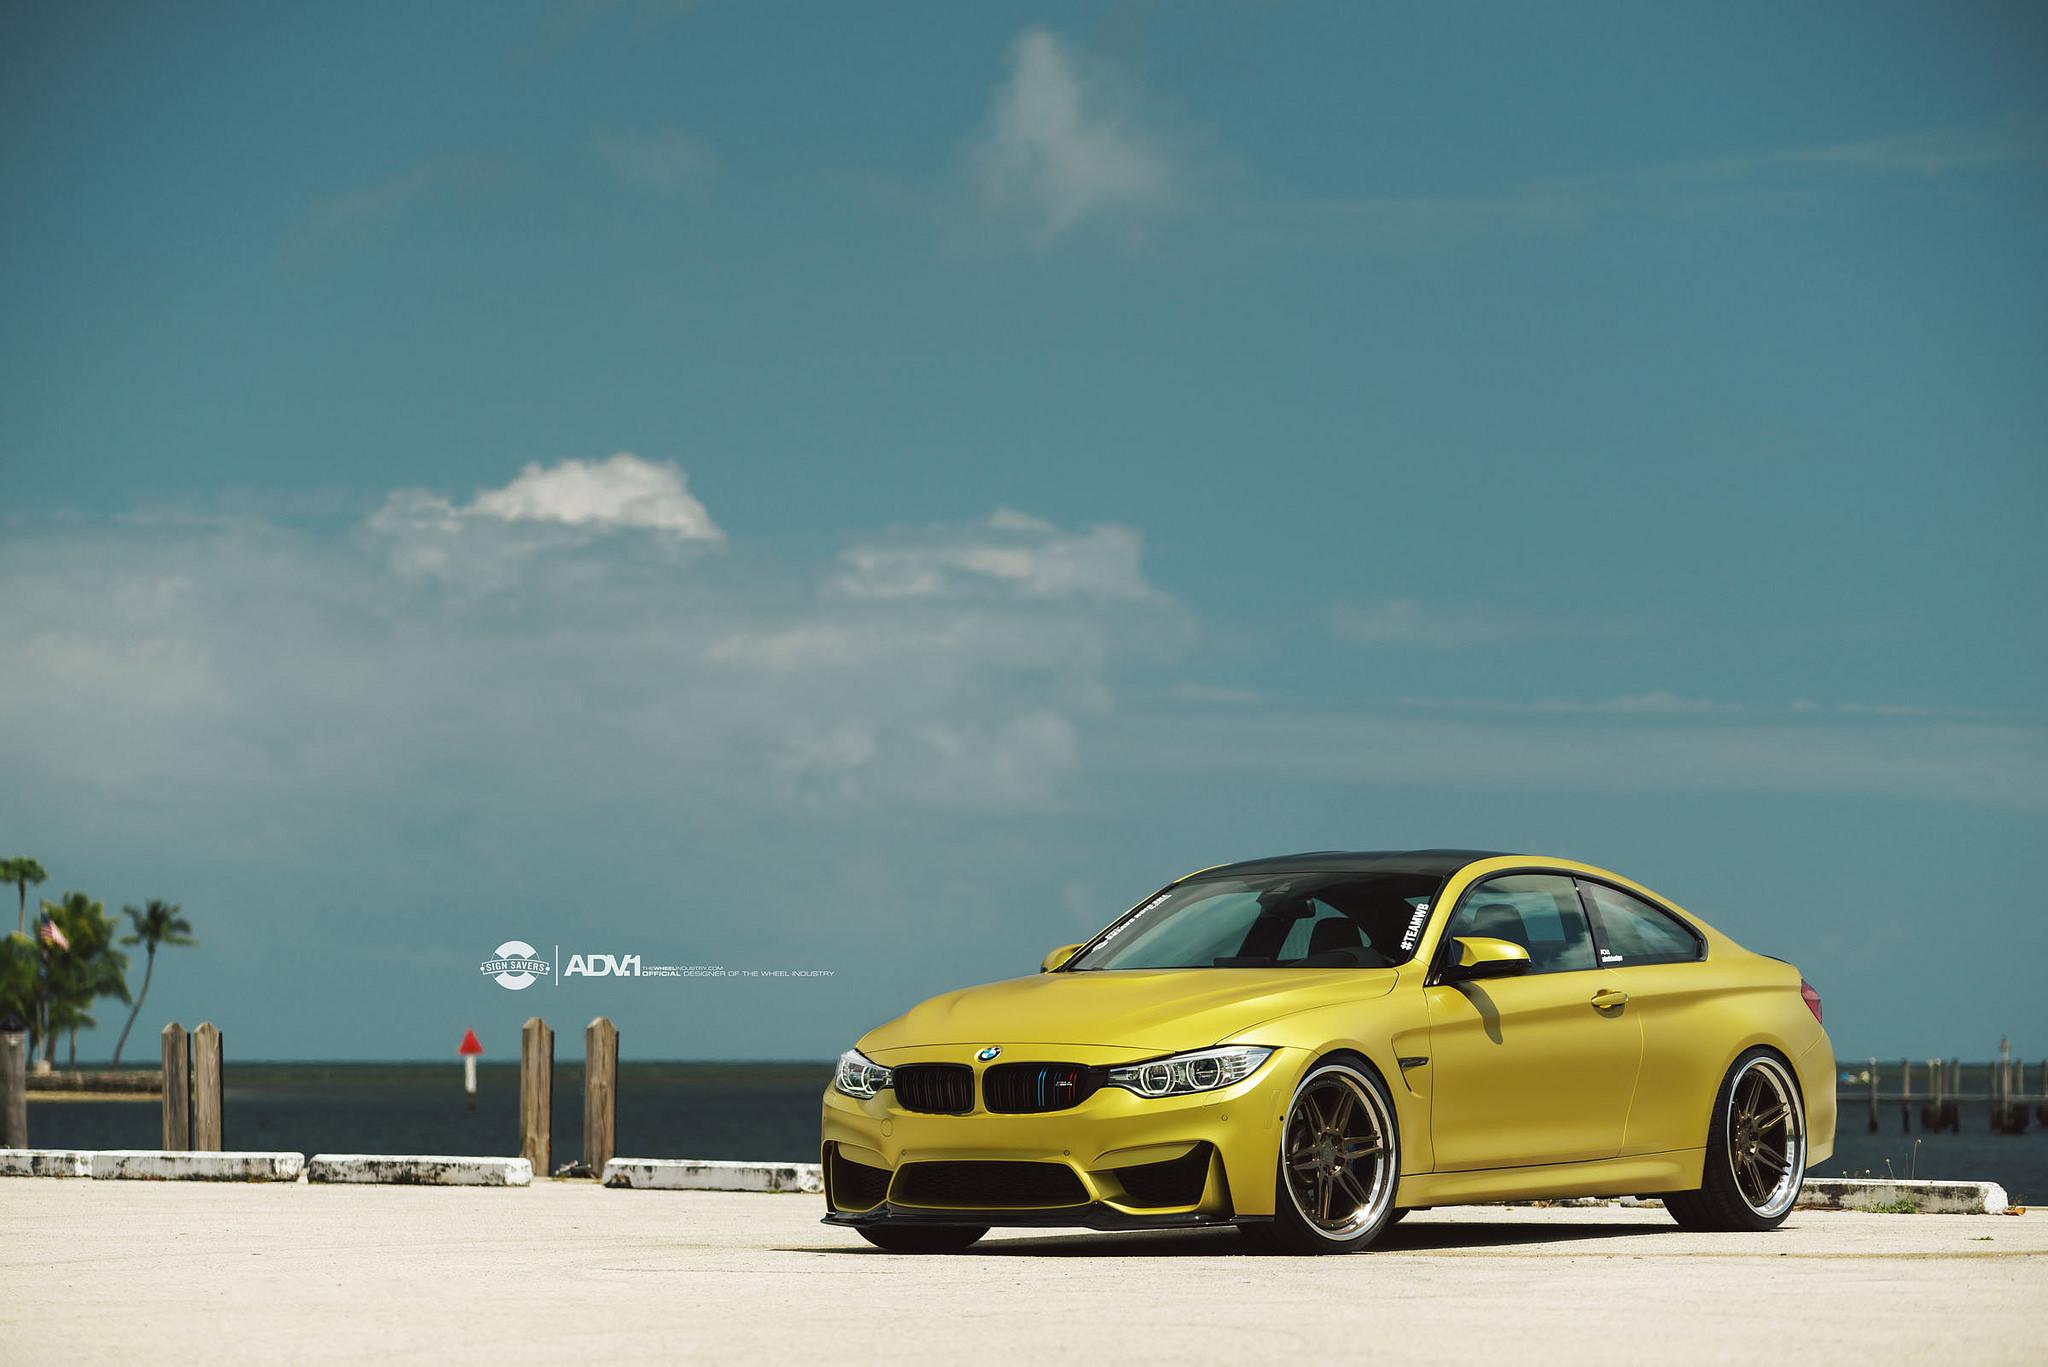 F82 BMW M4 Riding on ADV.1 Wheels